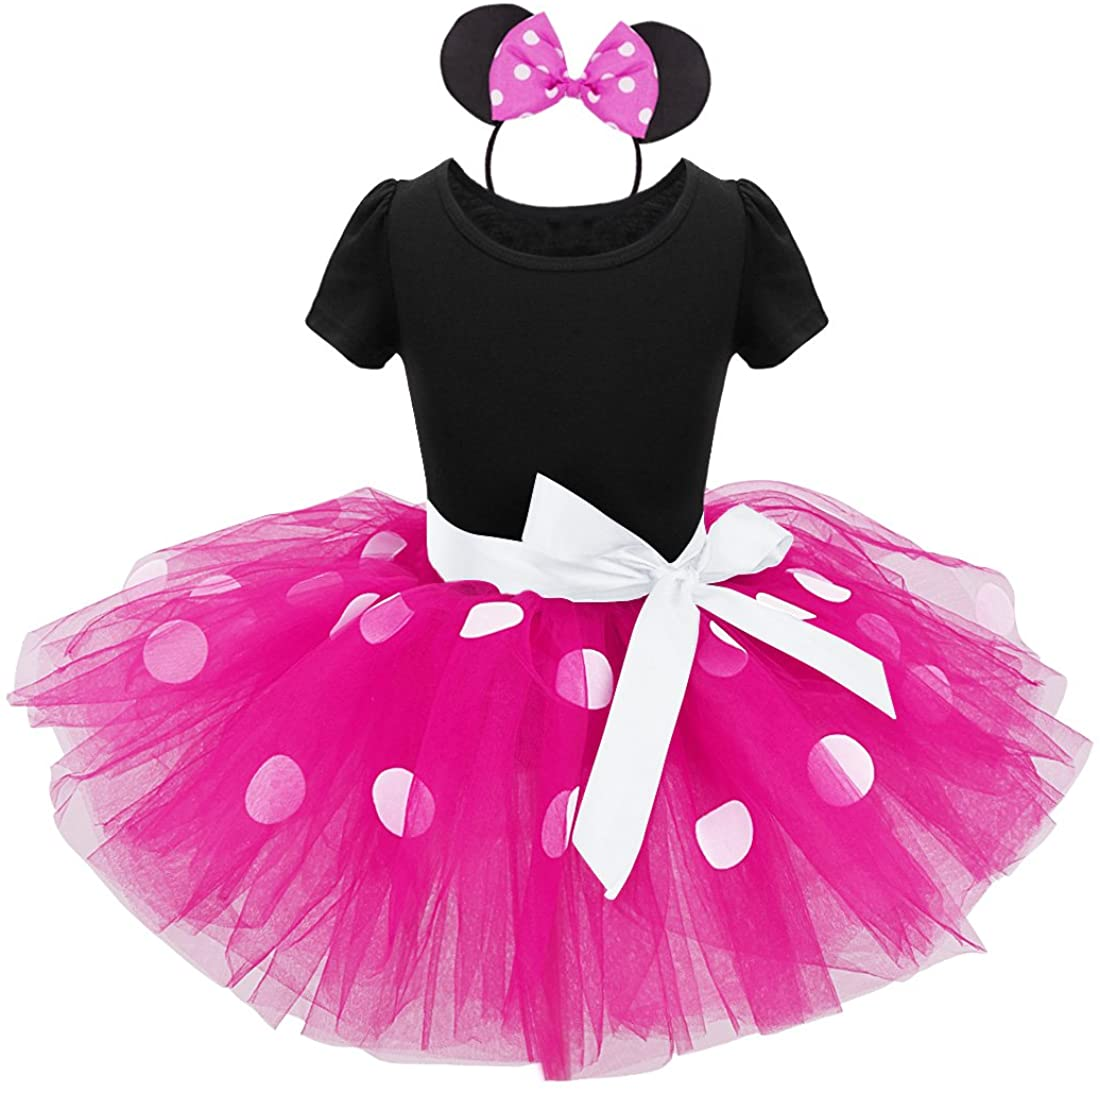 TiaoBug Girls Princess Polka Dots Bowknot Tutu Dress Party Costume Ear Headband (3T, Hot Pink)